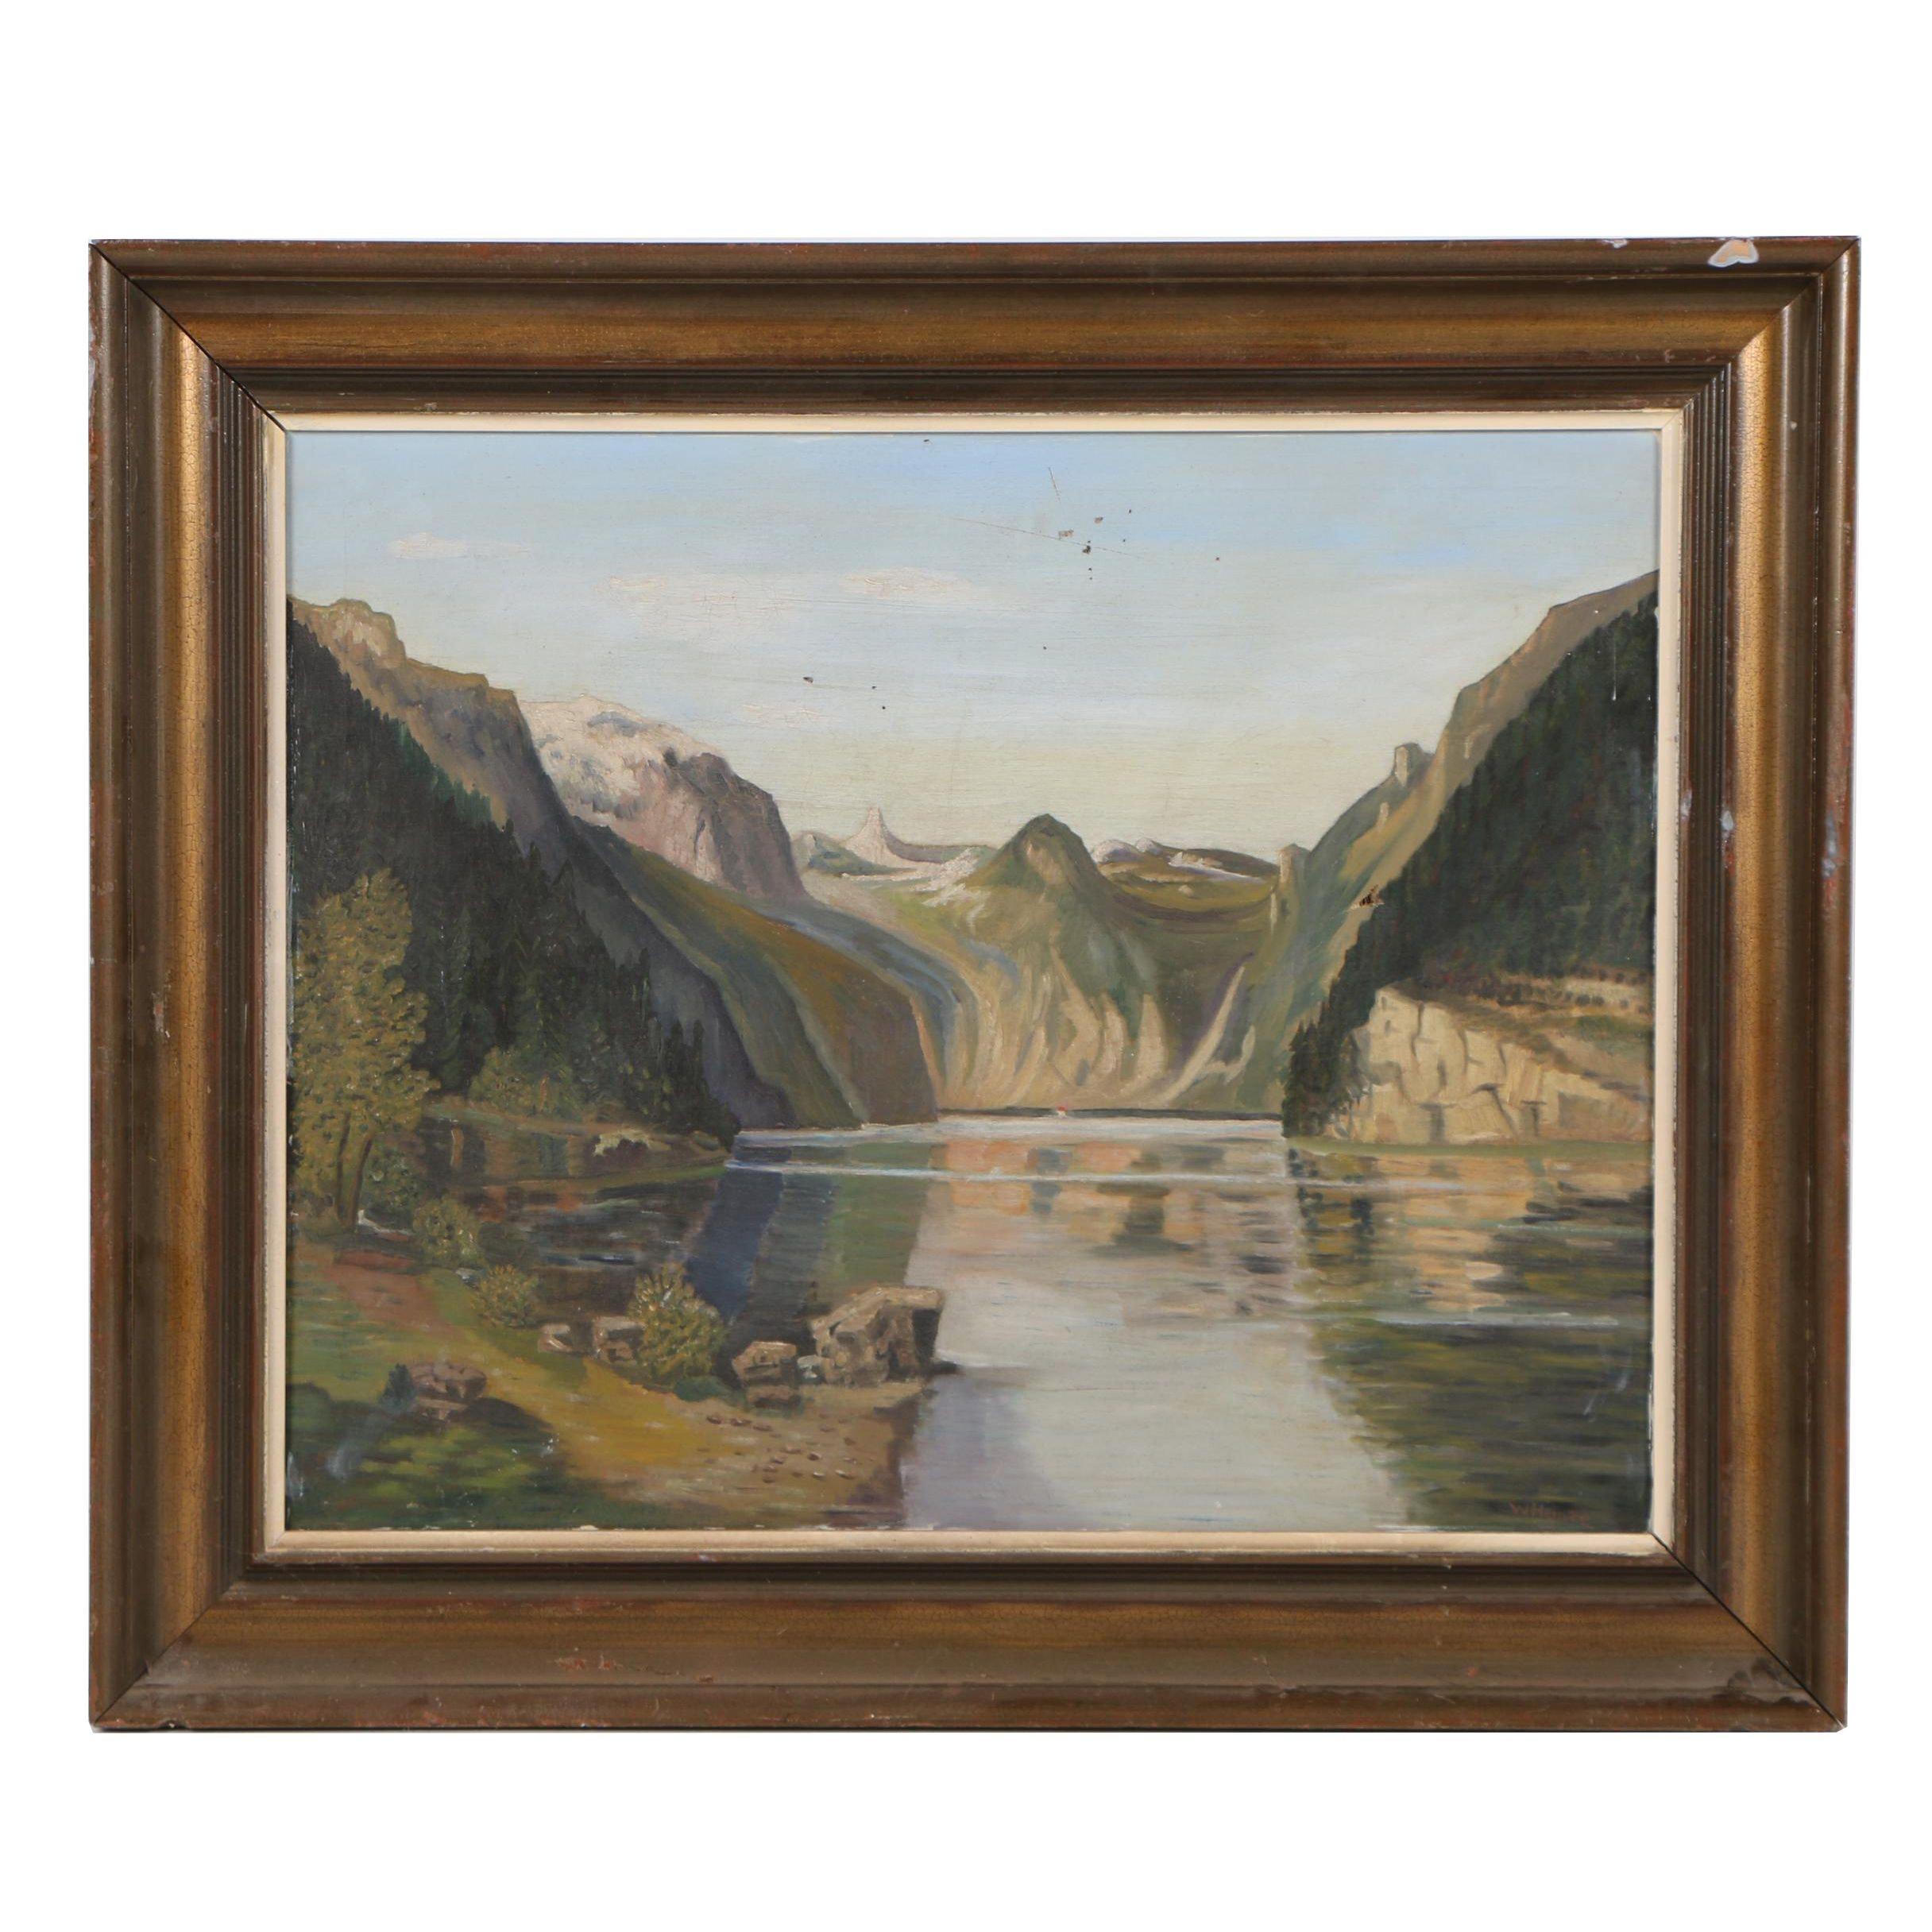 W. Heinze Landscape Oil Painting